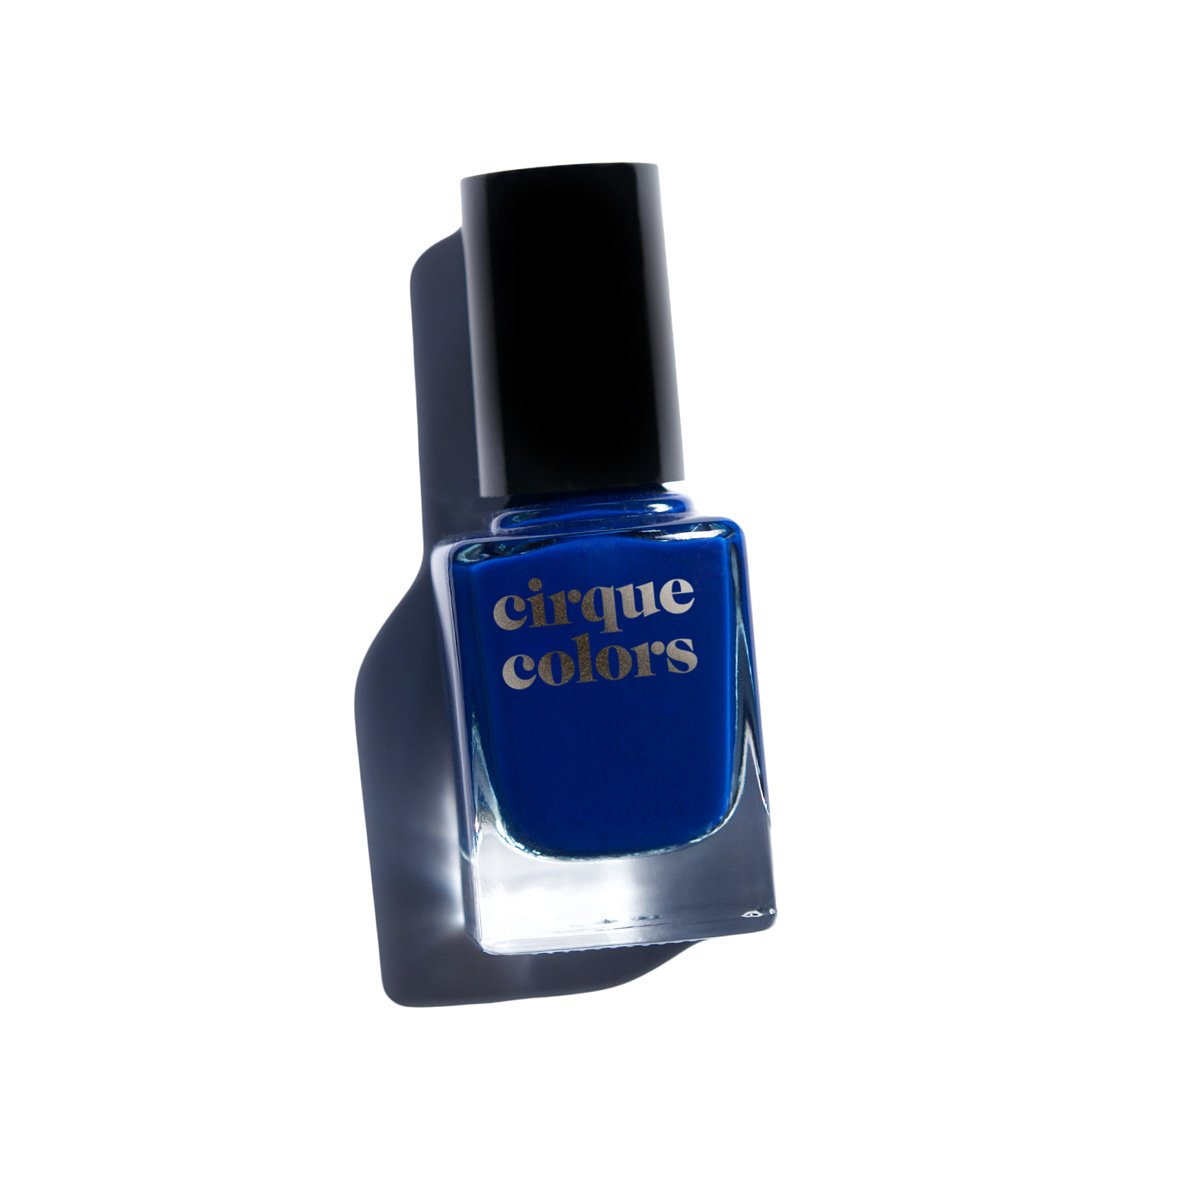 Amazon.com : Cirque Colors Crème Nail Polish - Midnight Cowboy ...